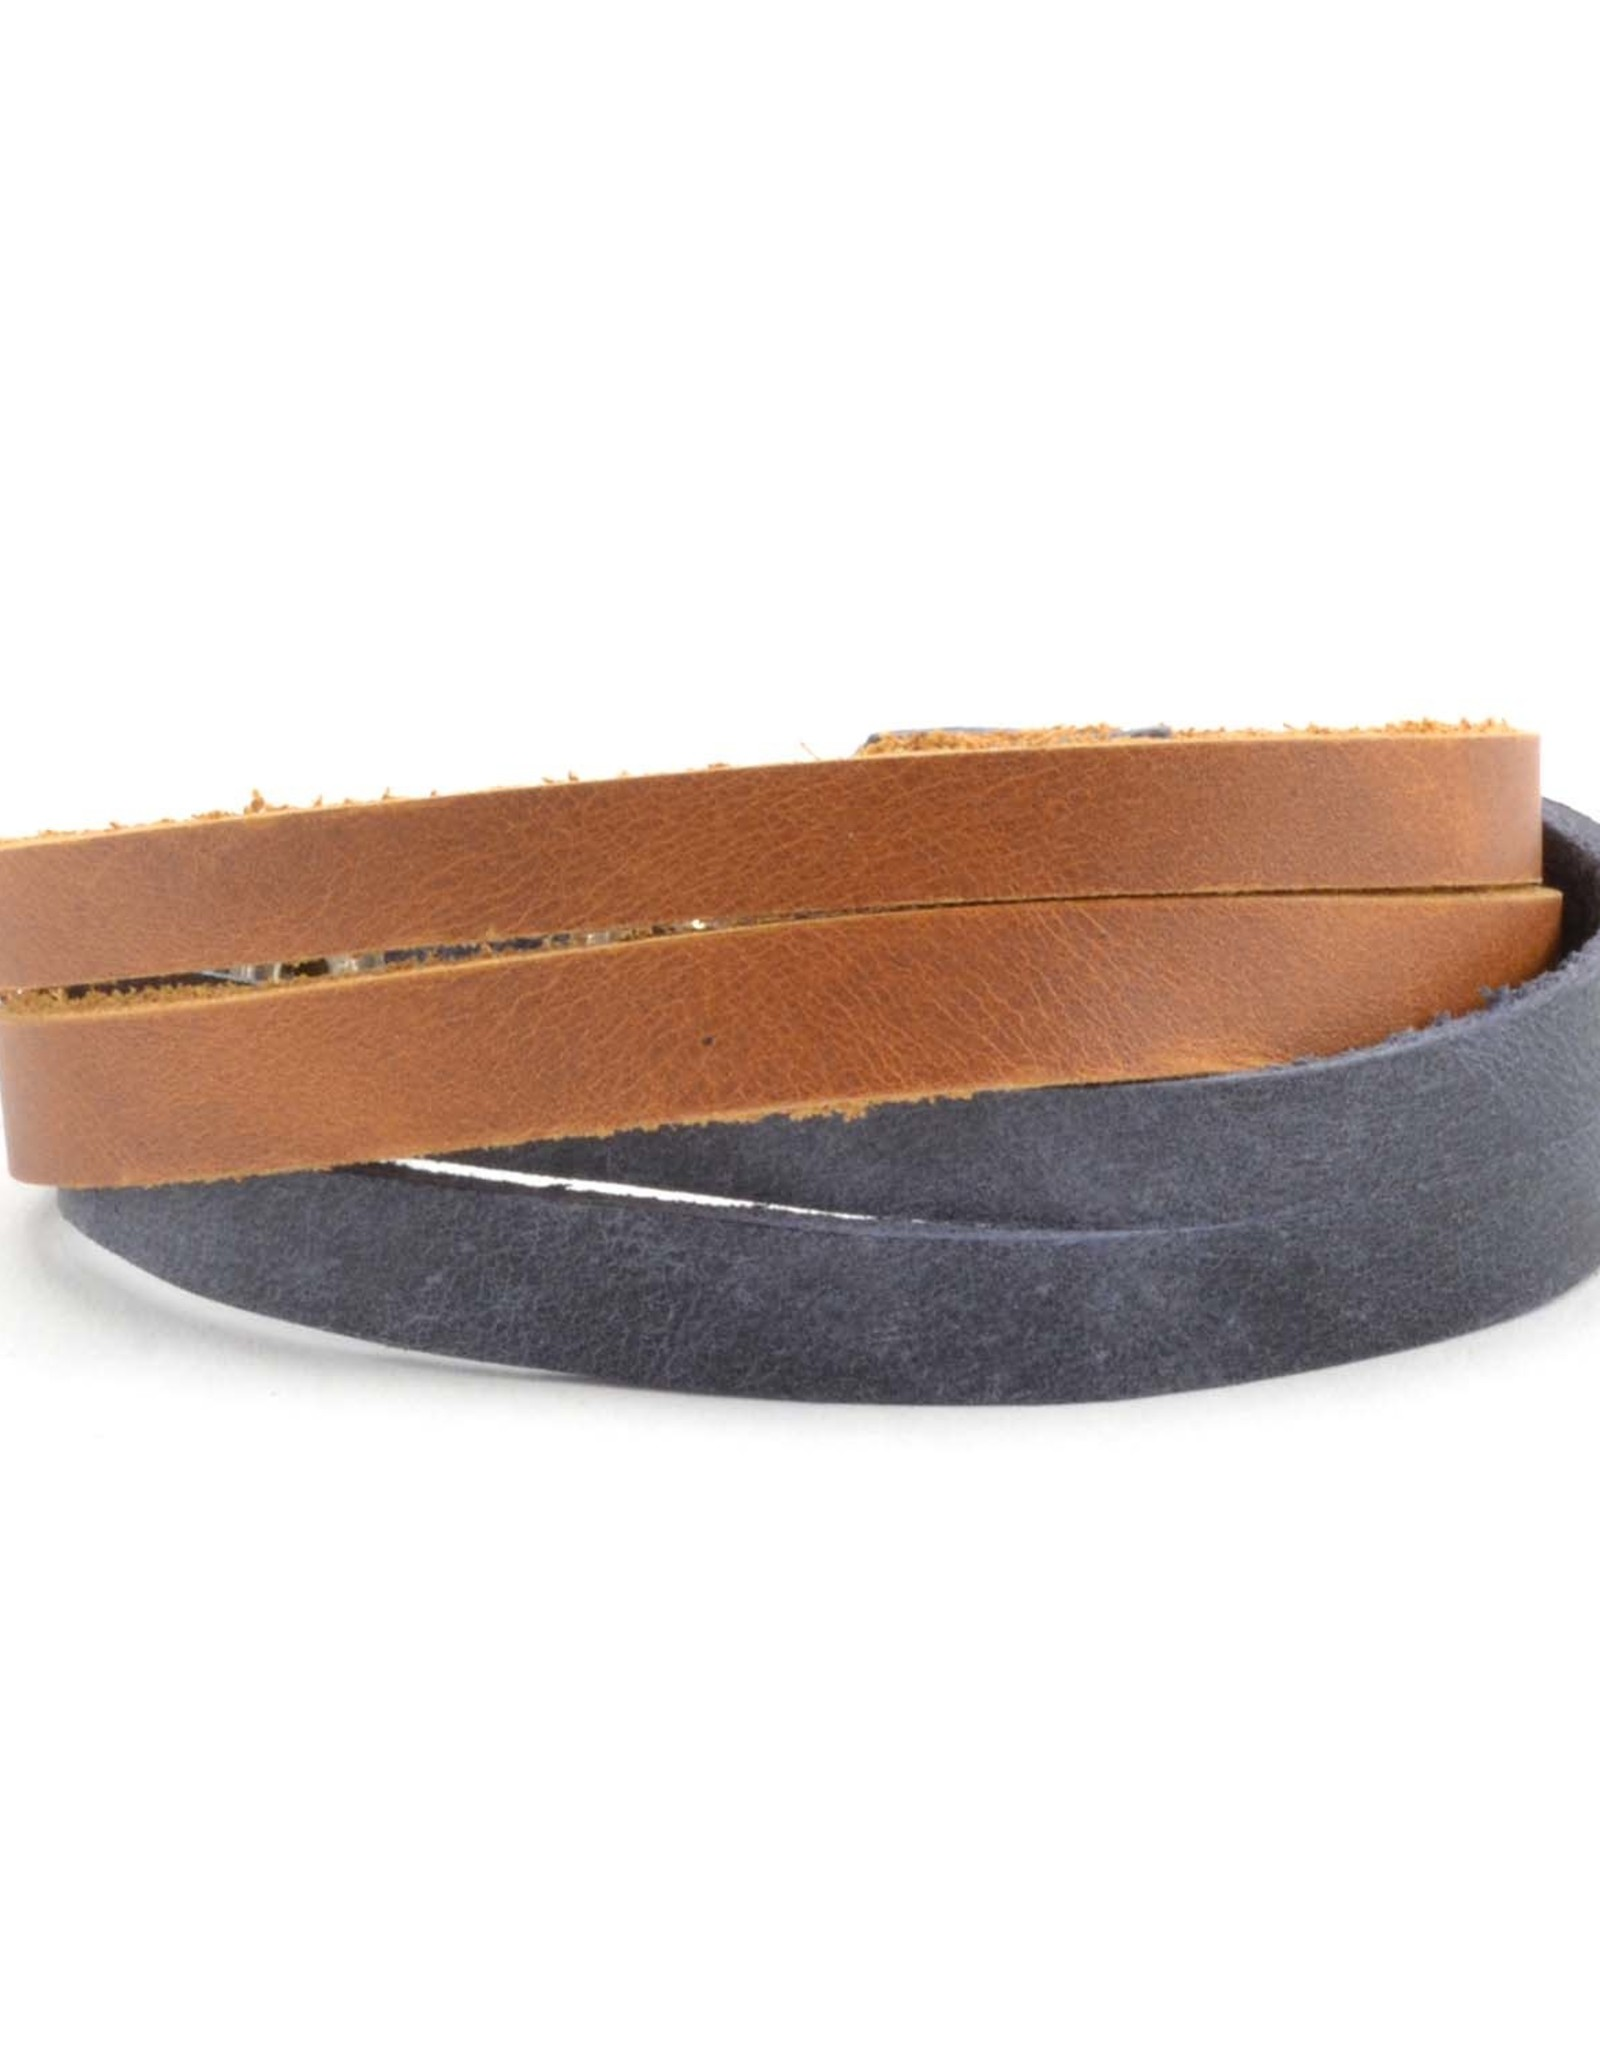 Lucia's Imports Criss Cross Leather Bracelet